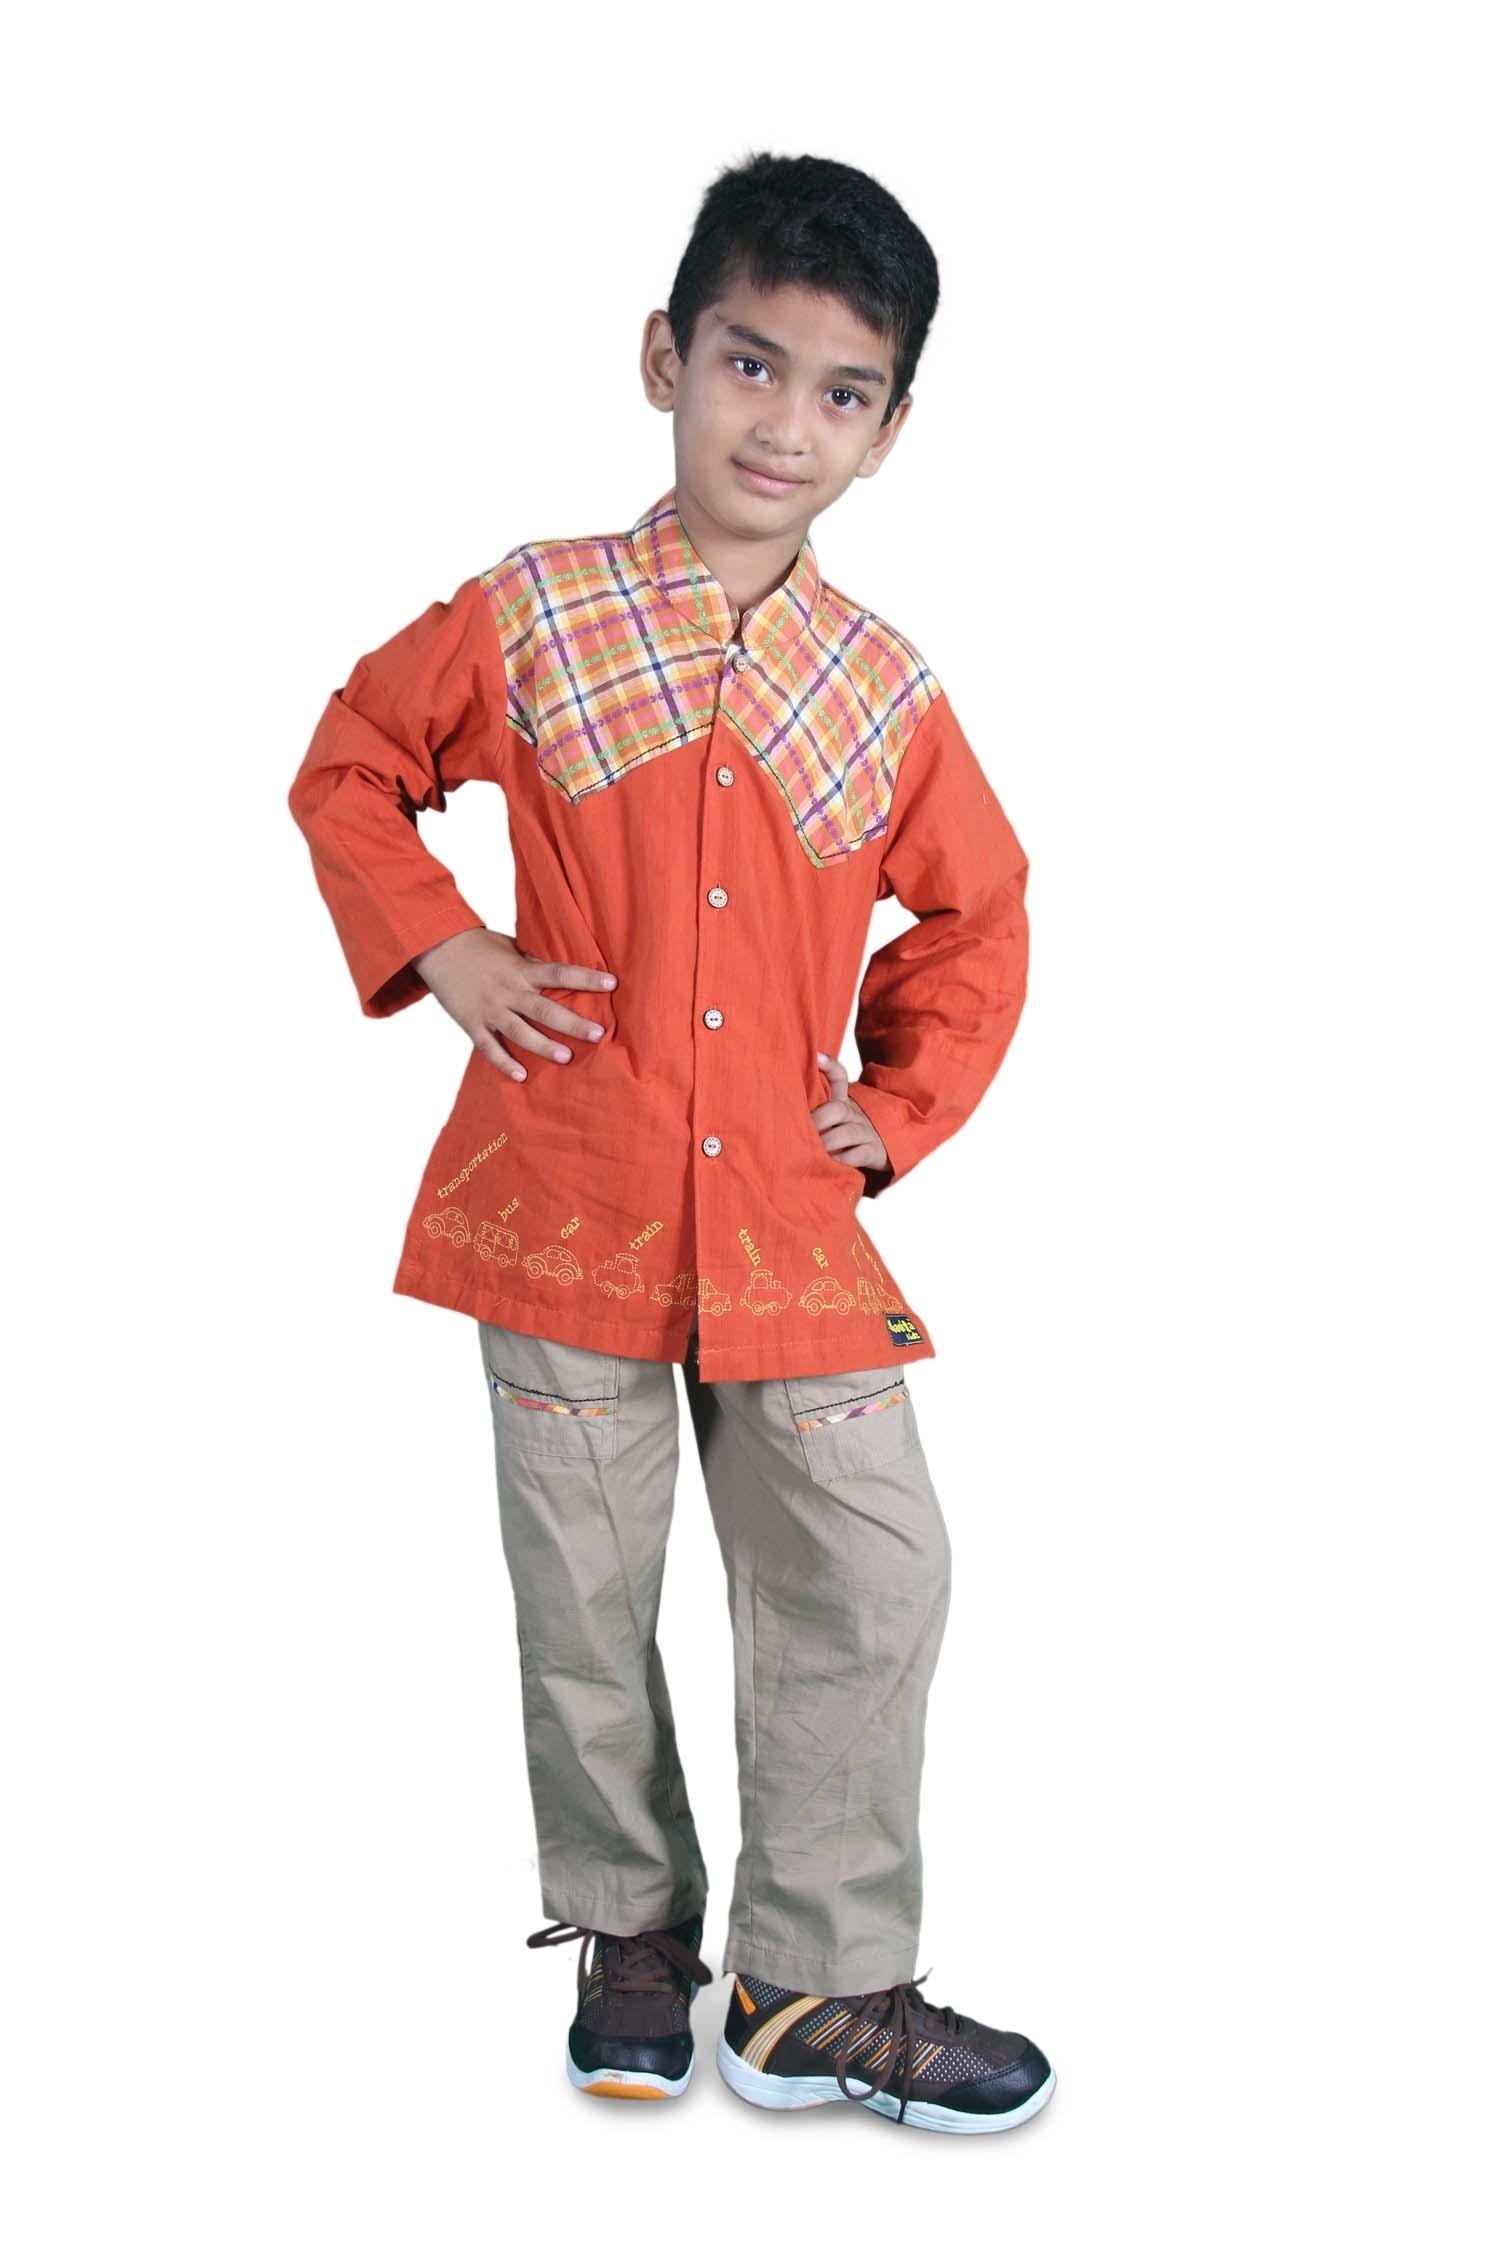 Baju Koko untuk Anak Laki-Laki Muslim dengan Model Terbaru